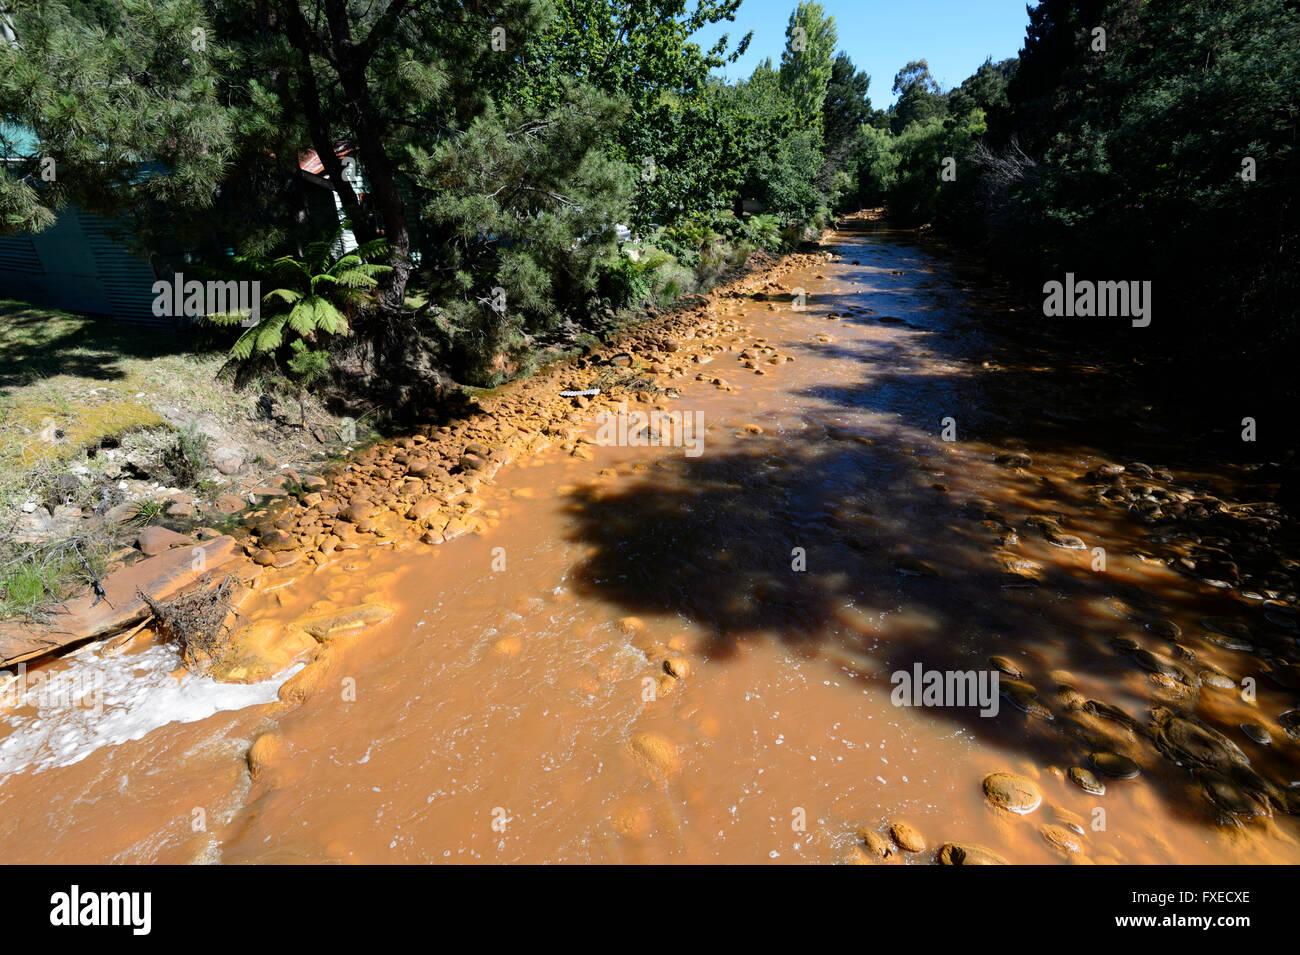 King River is acid-contaminated from mining, Queenstown, Tasmania, TAS, Australia - Stock Image